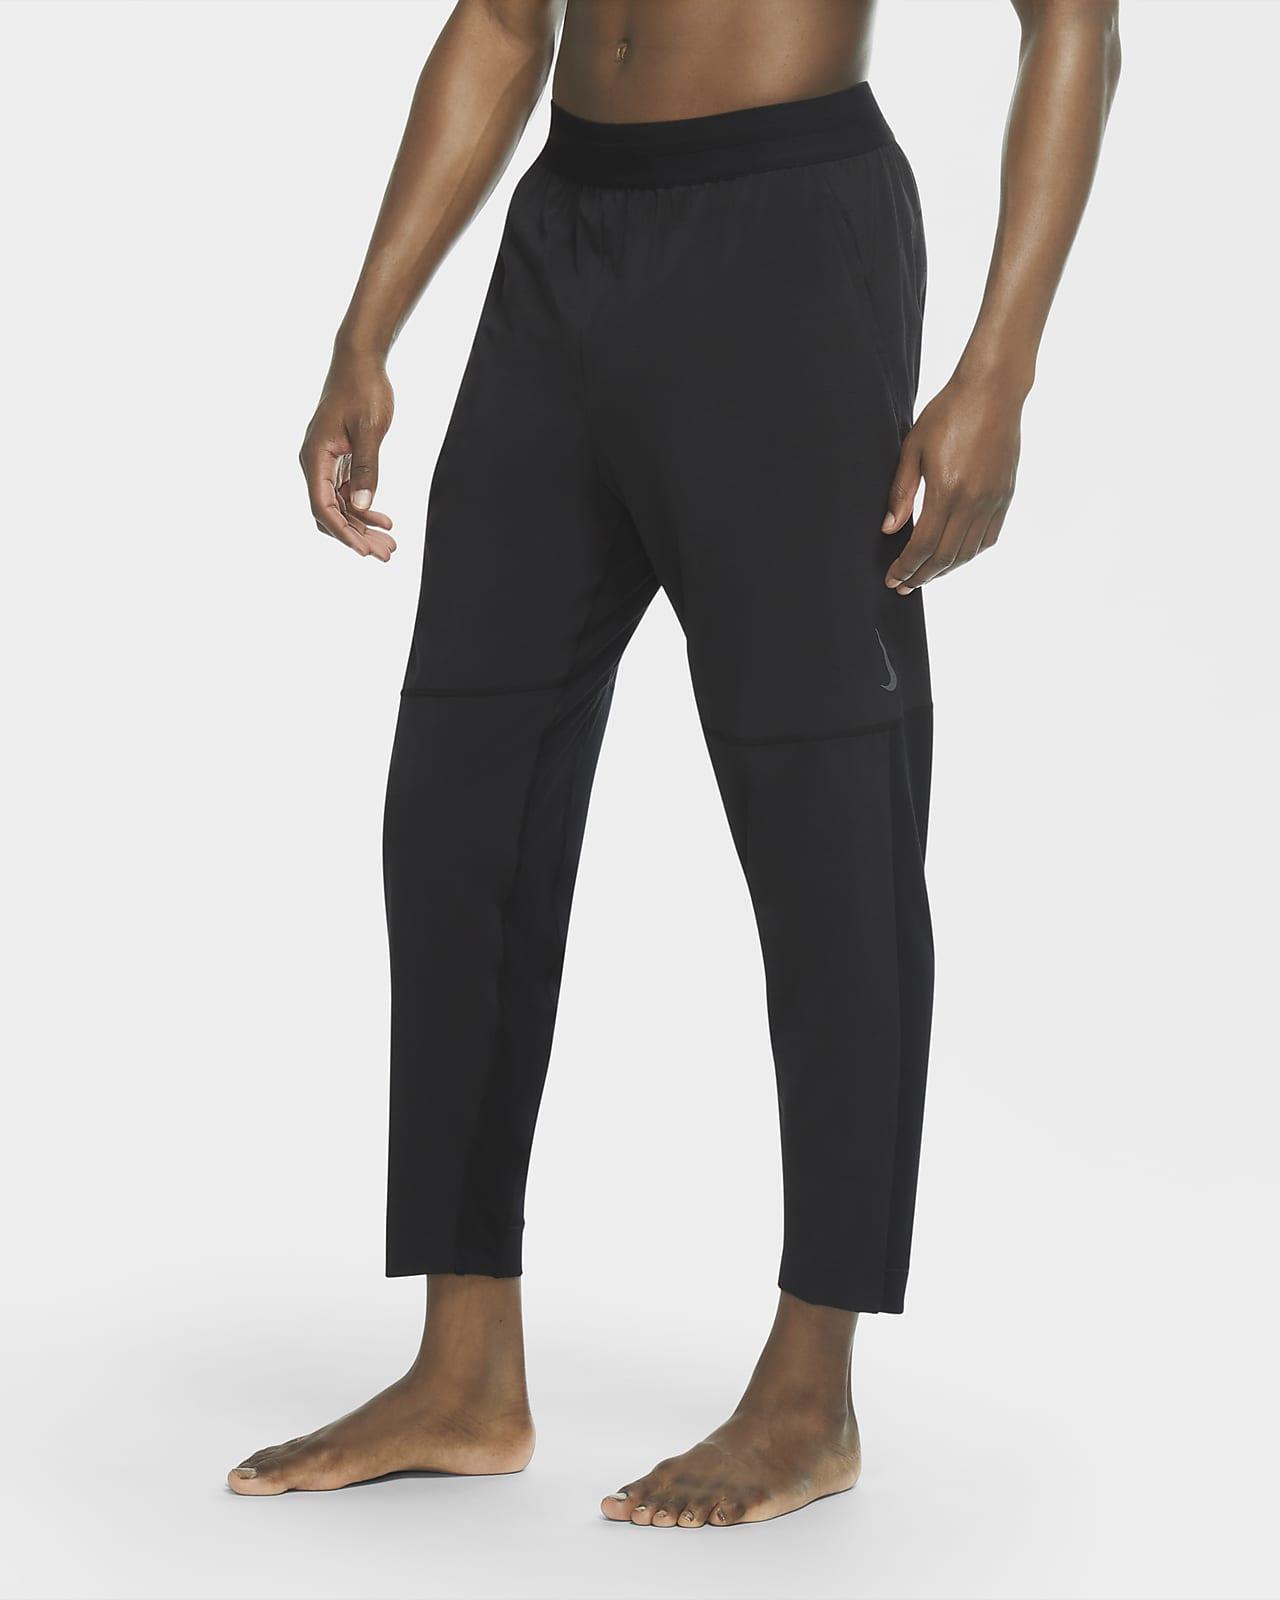 Pánské kalhoty Nike Yoga